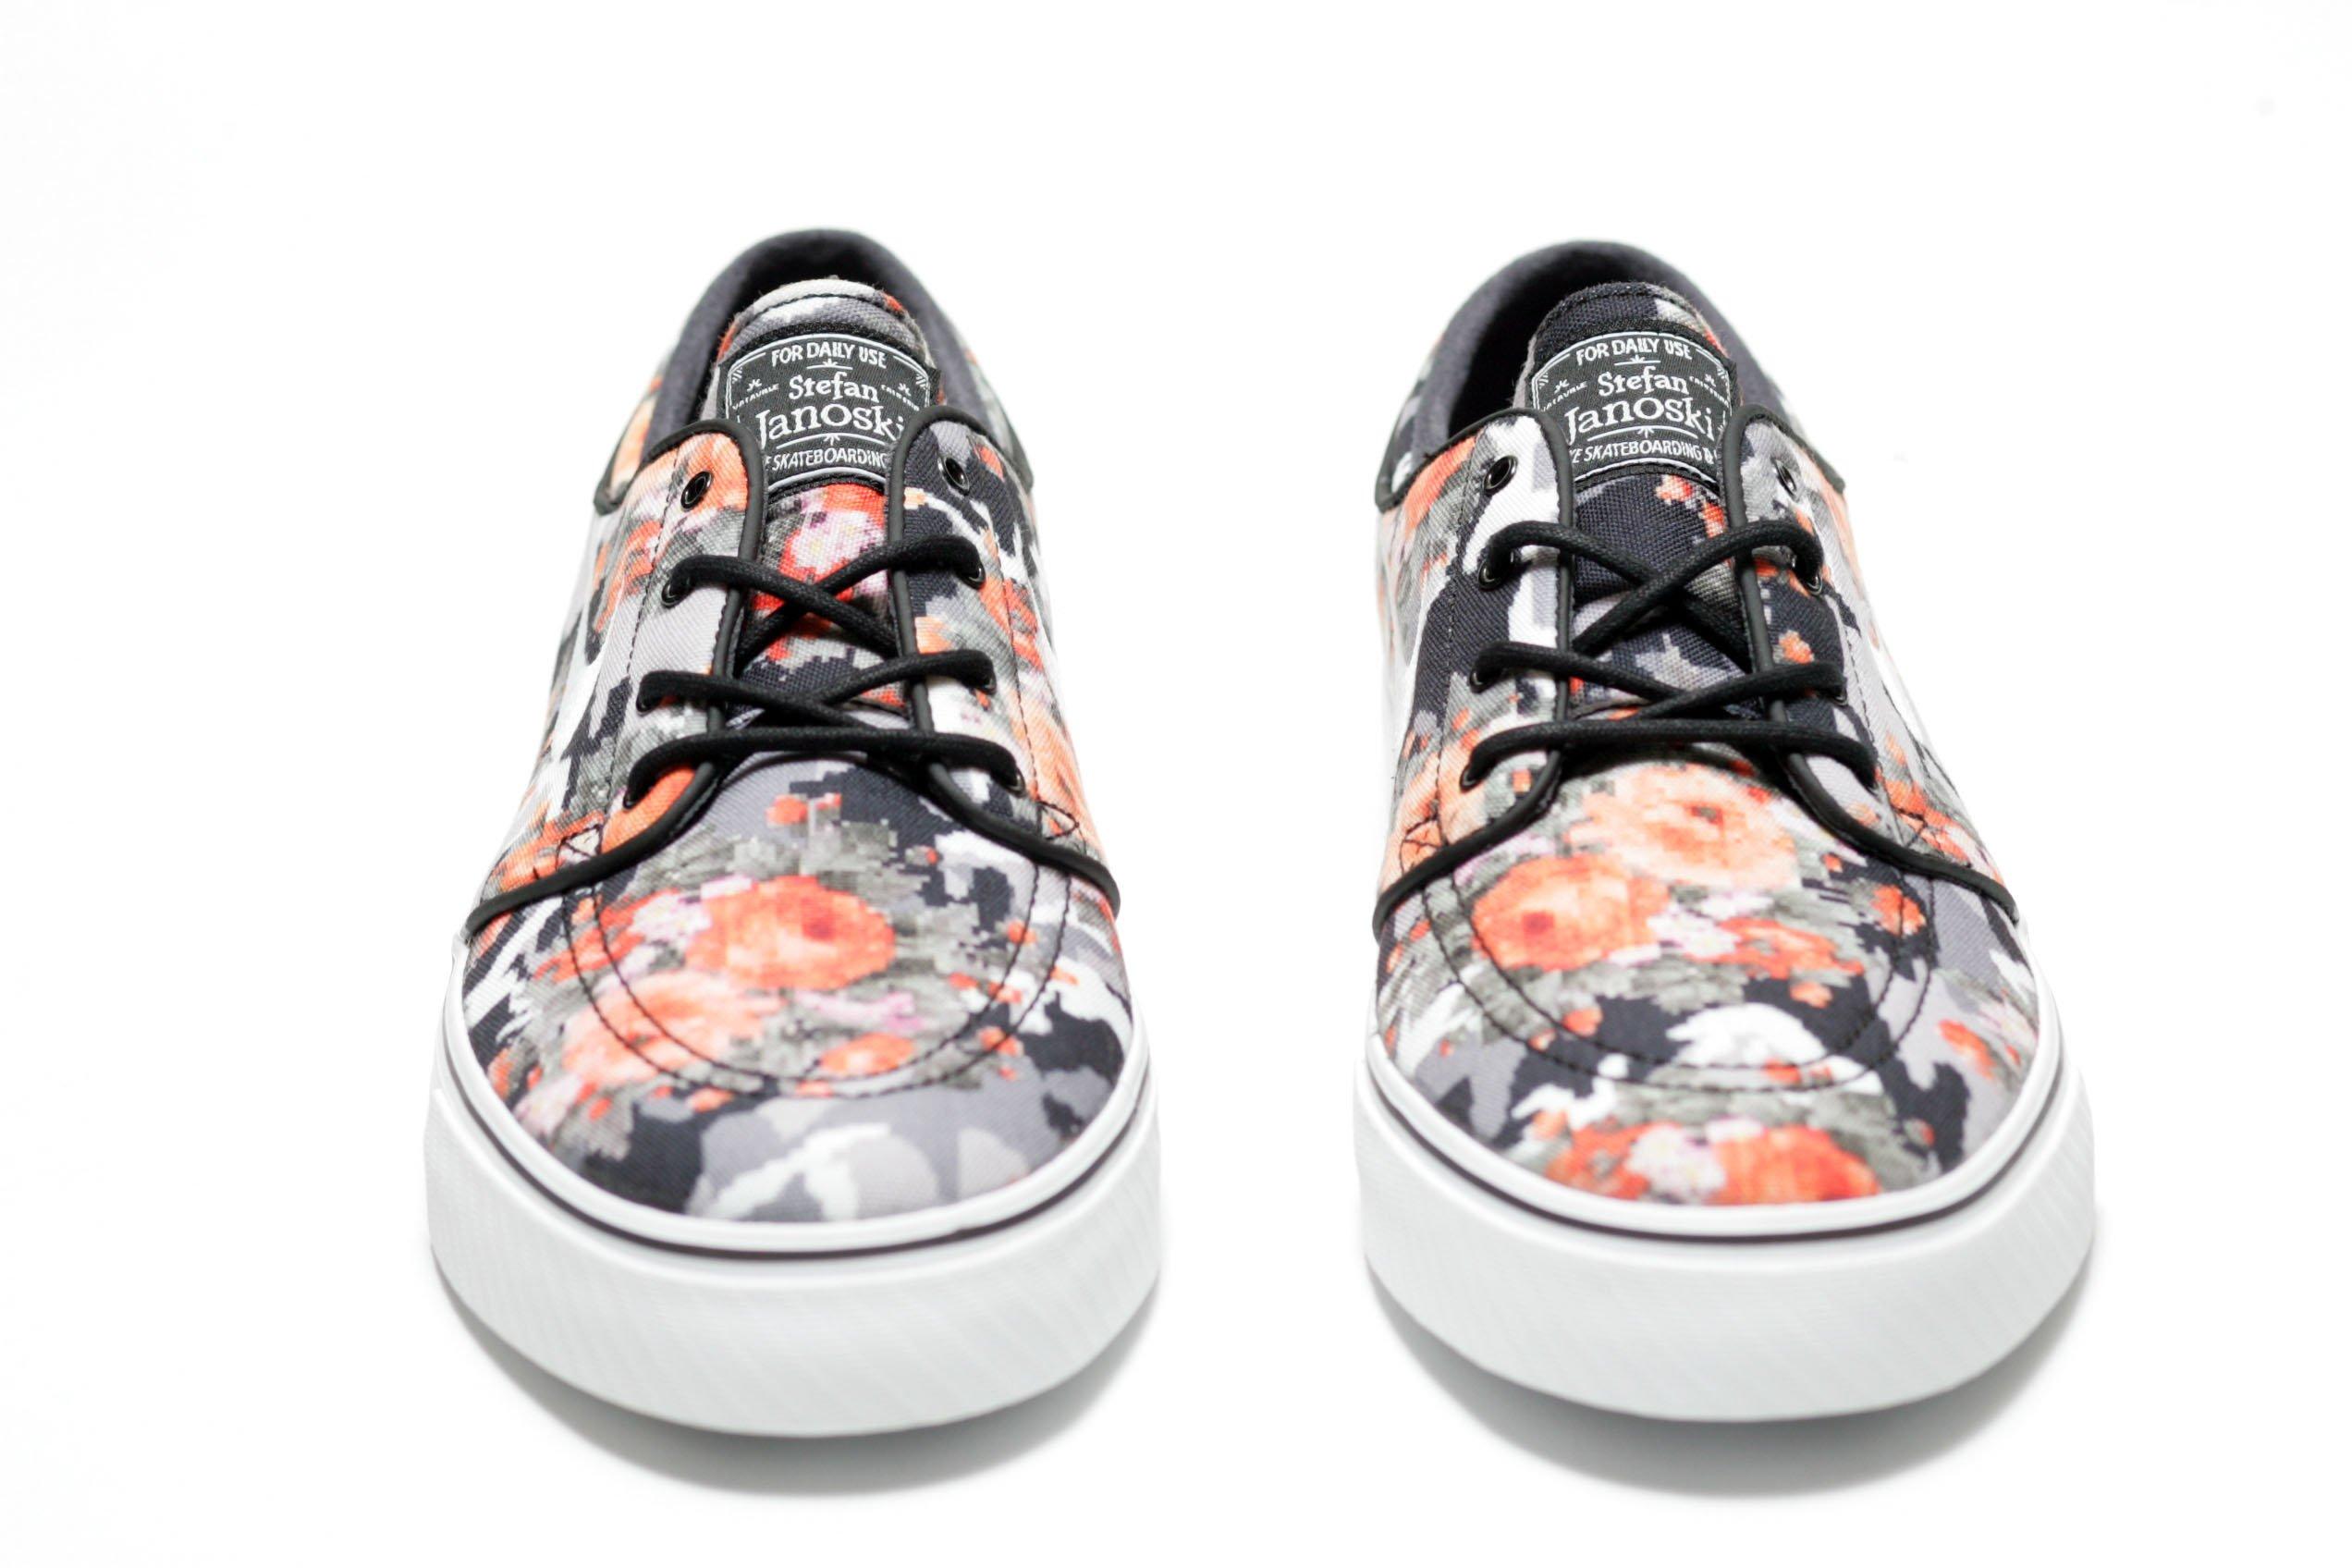 nike-sb-stefan-janoski-digi-floral-qs-multi-color-black-mandarin-release-date-info-4